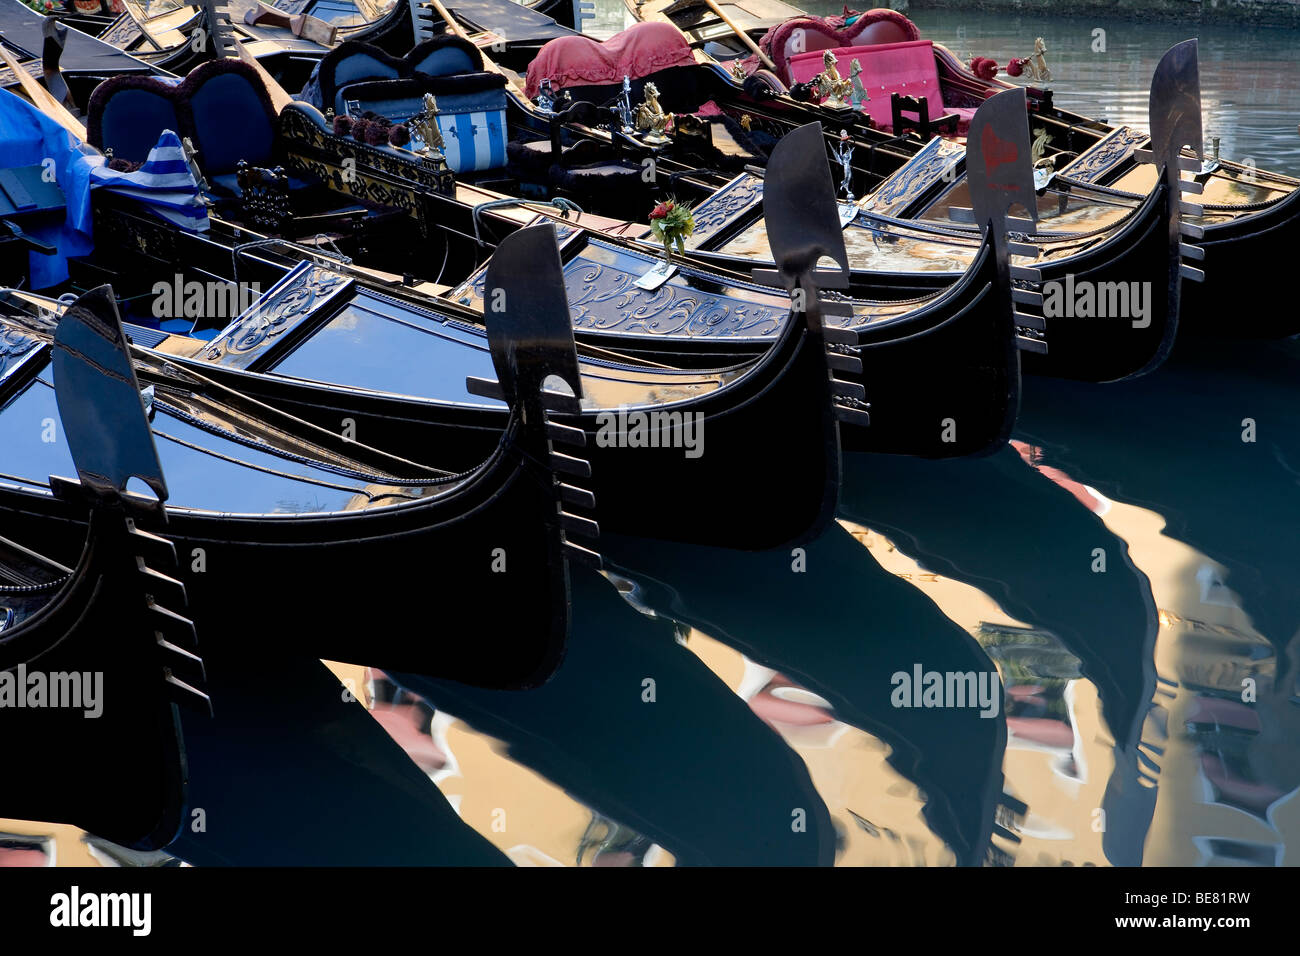 Gondolas at Bacino Orseolo (Servizio Gondole), Venice, Italy, Europe - Stock Image